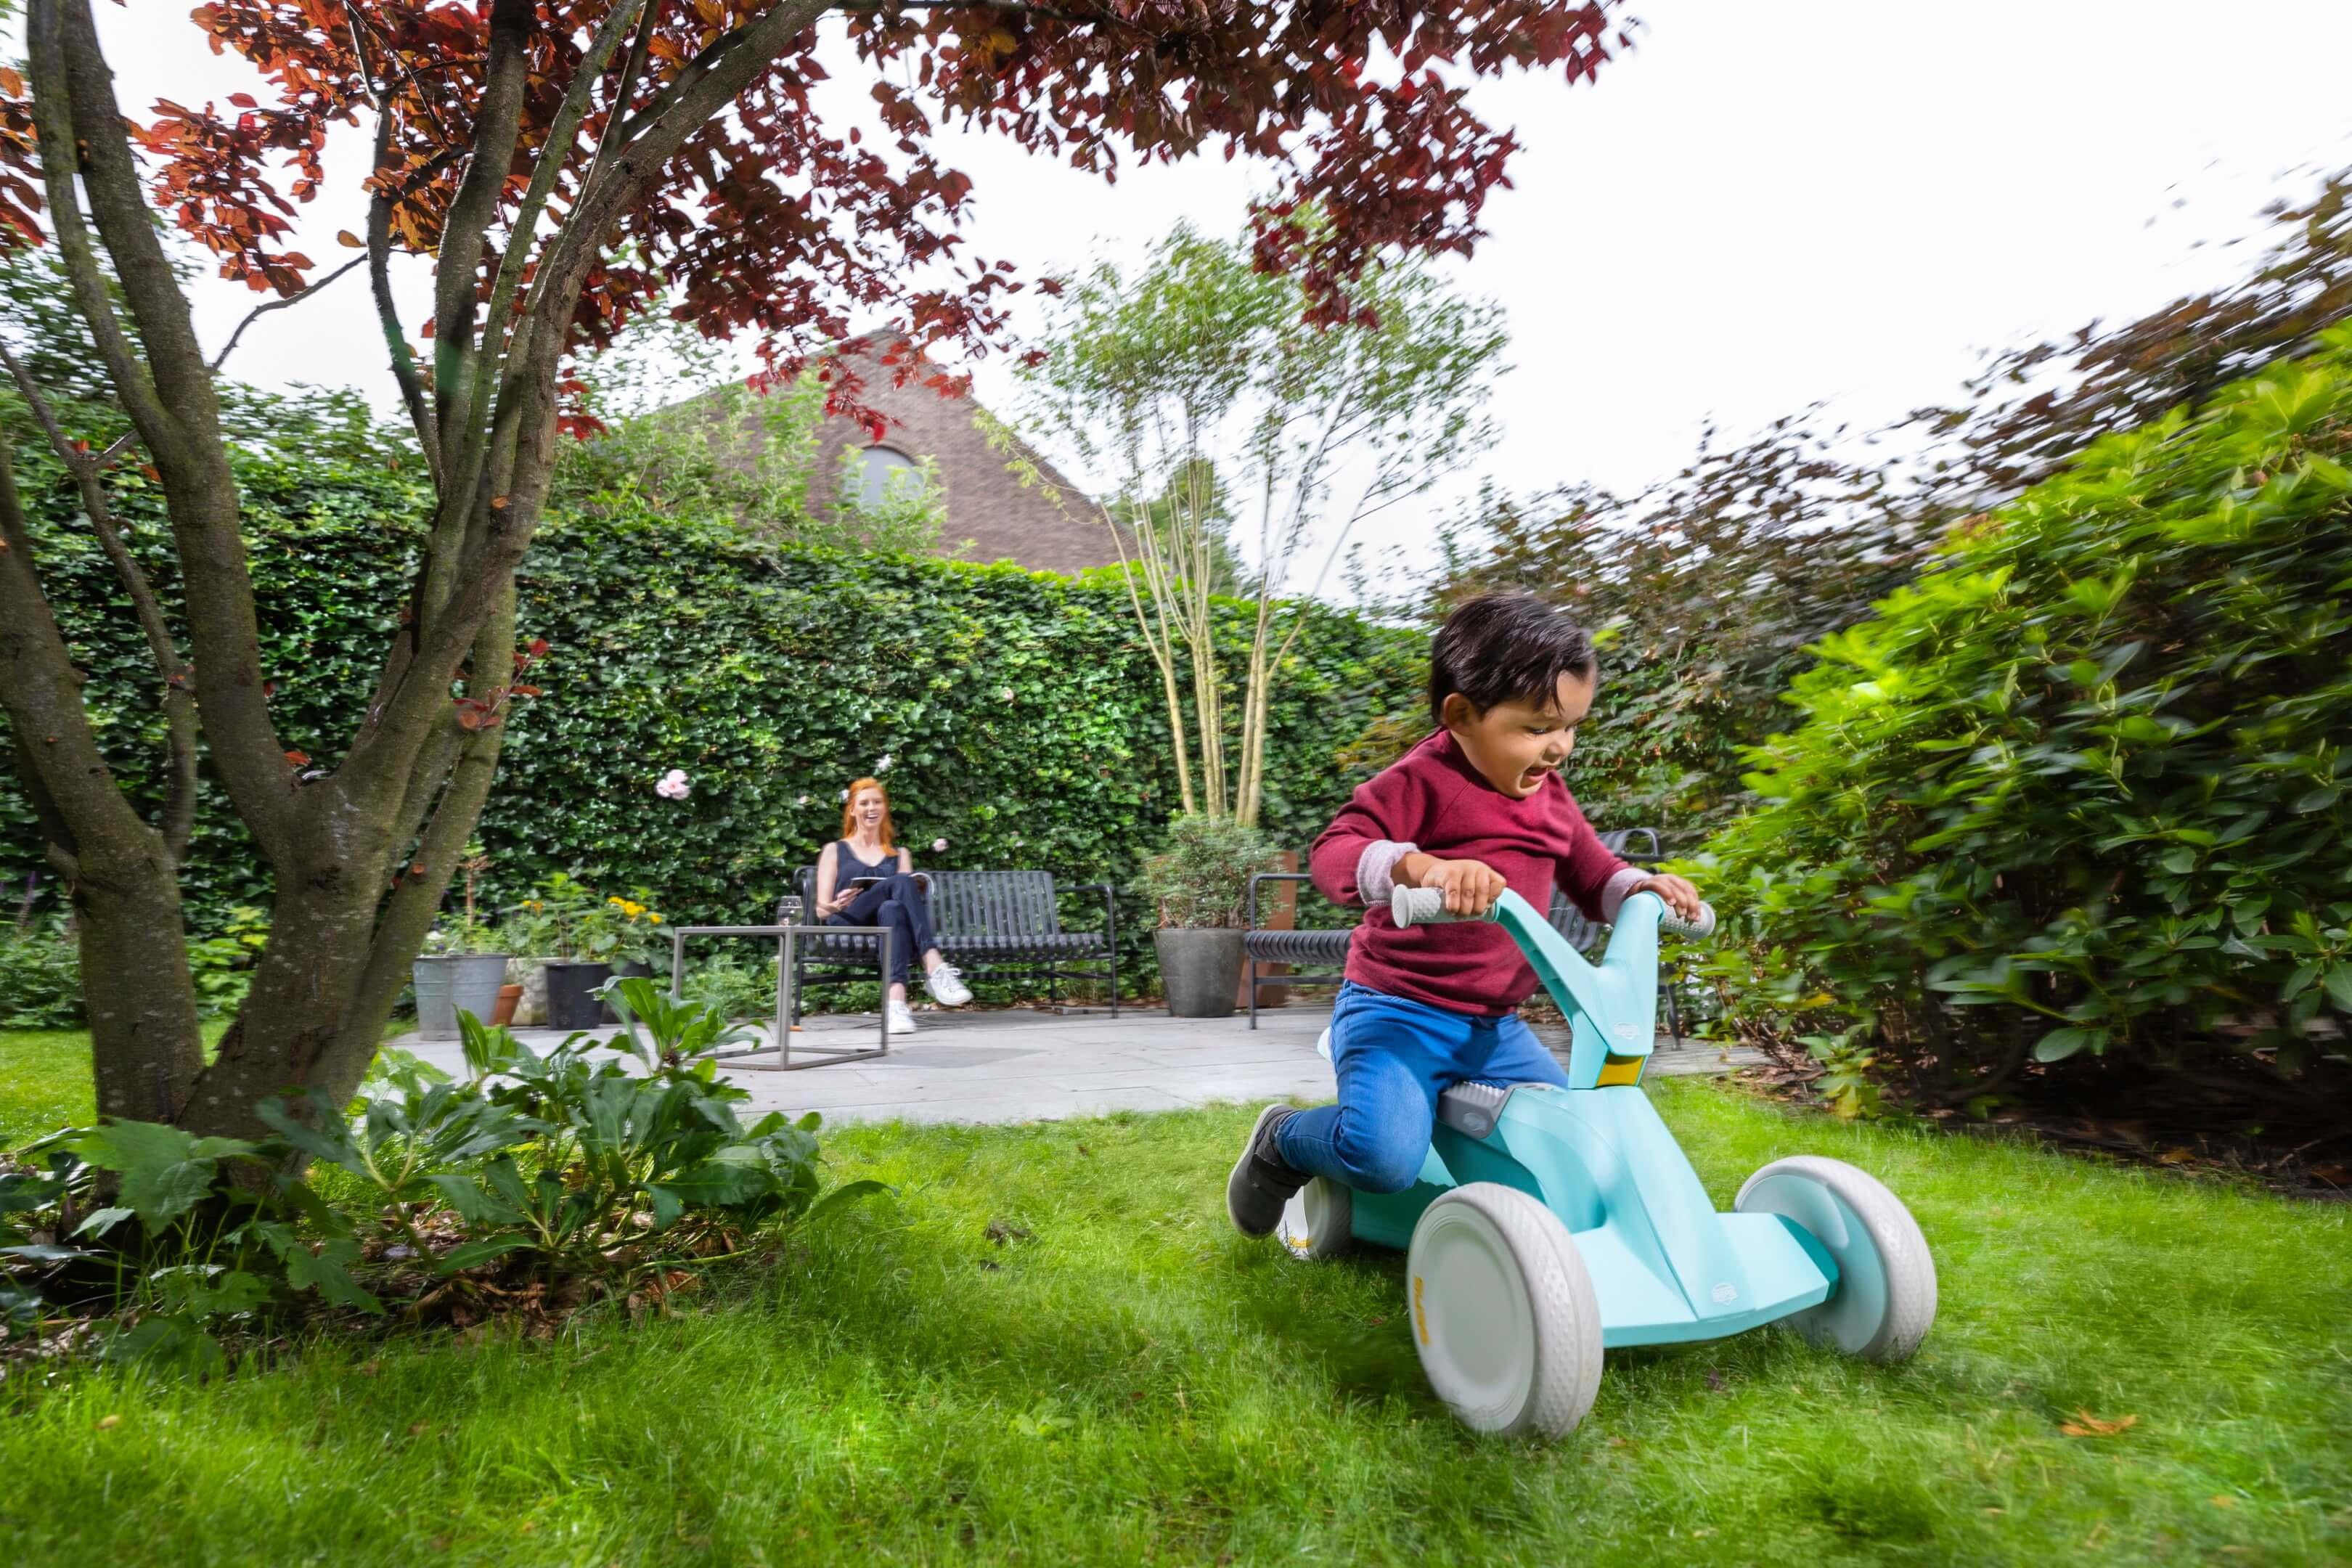 Jurjen Poeles fotografie Berg Toys lifestyle go2 pedal cart pedalcart skelter kinder speelgoed kind interieur productfotografie product locatie studio tuin